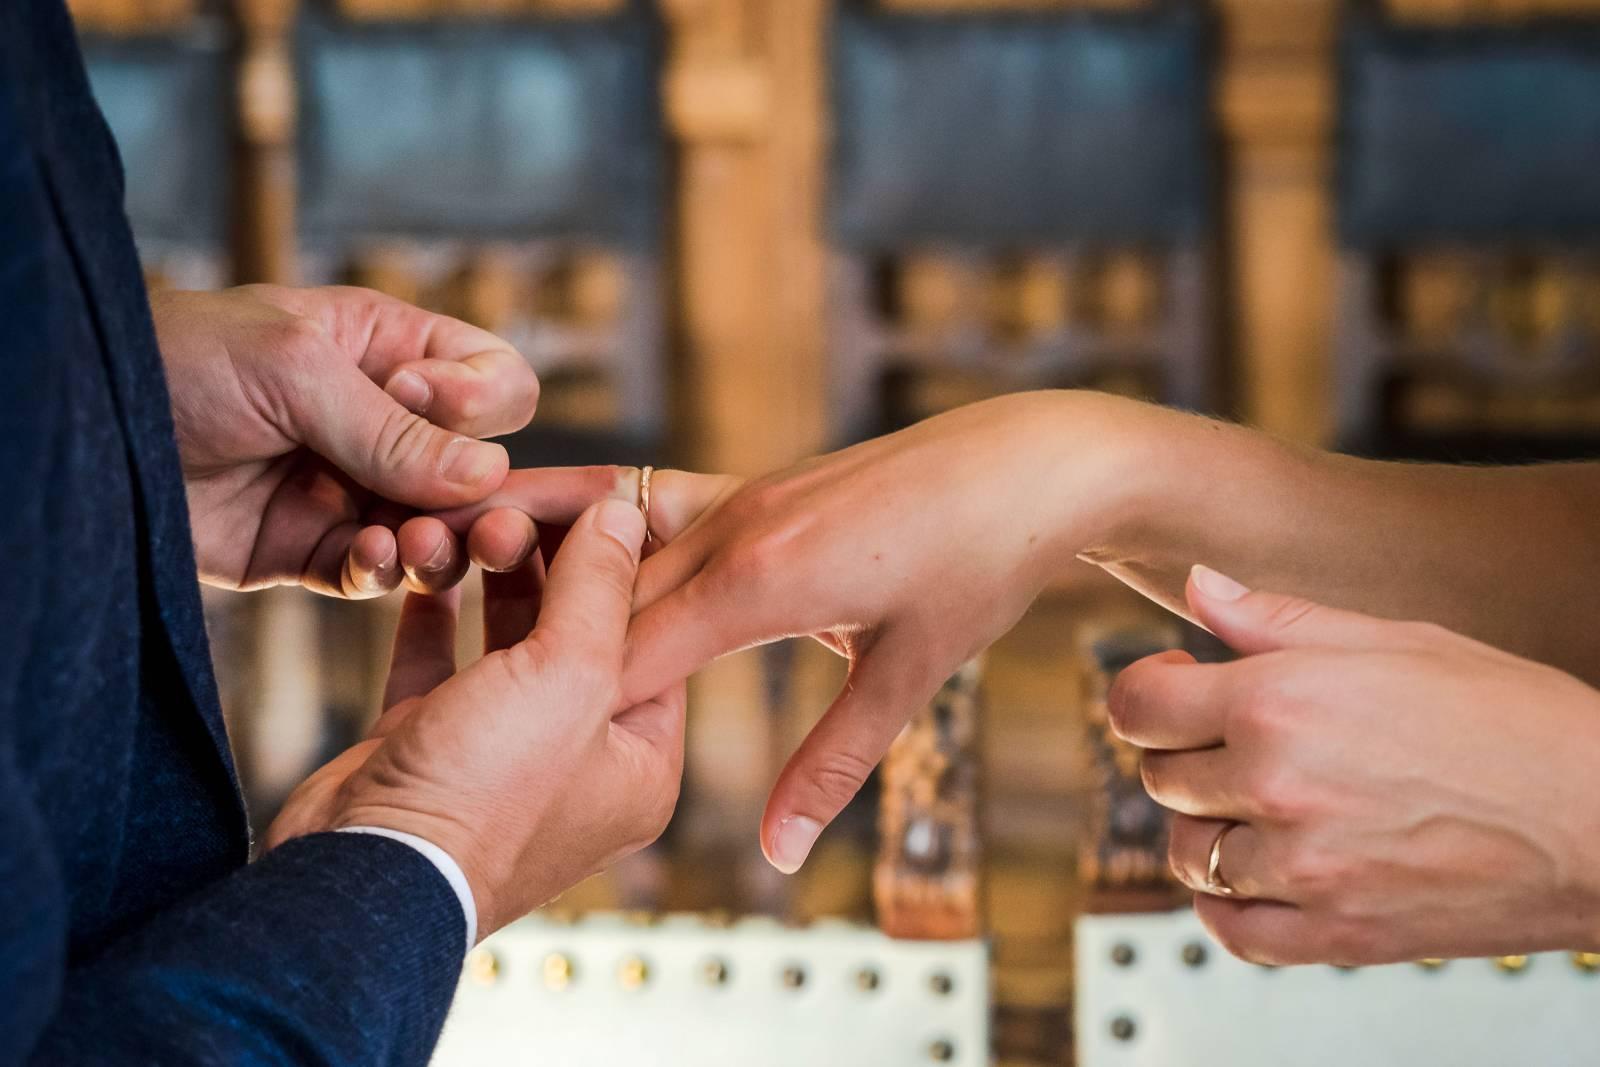 Stefanie Condes - Bruidsjuwelen - House of Weddings - 3